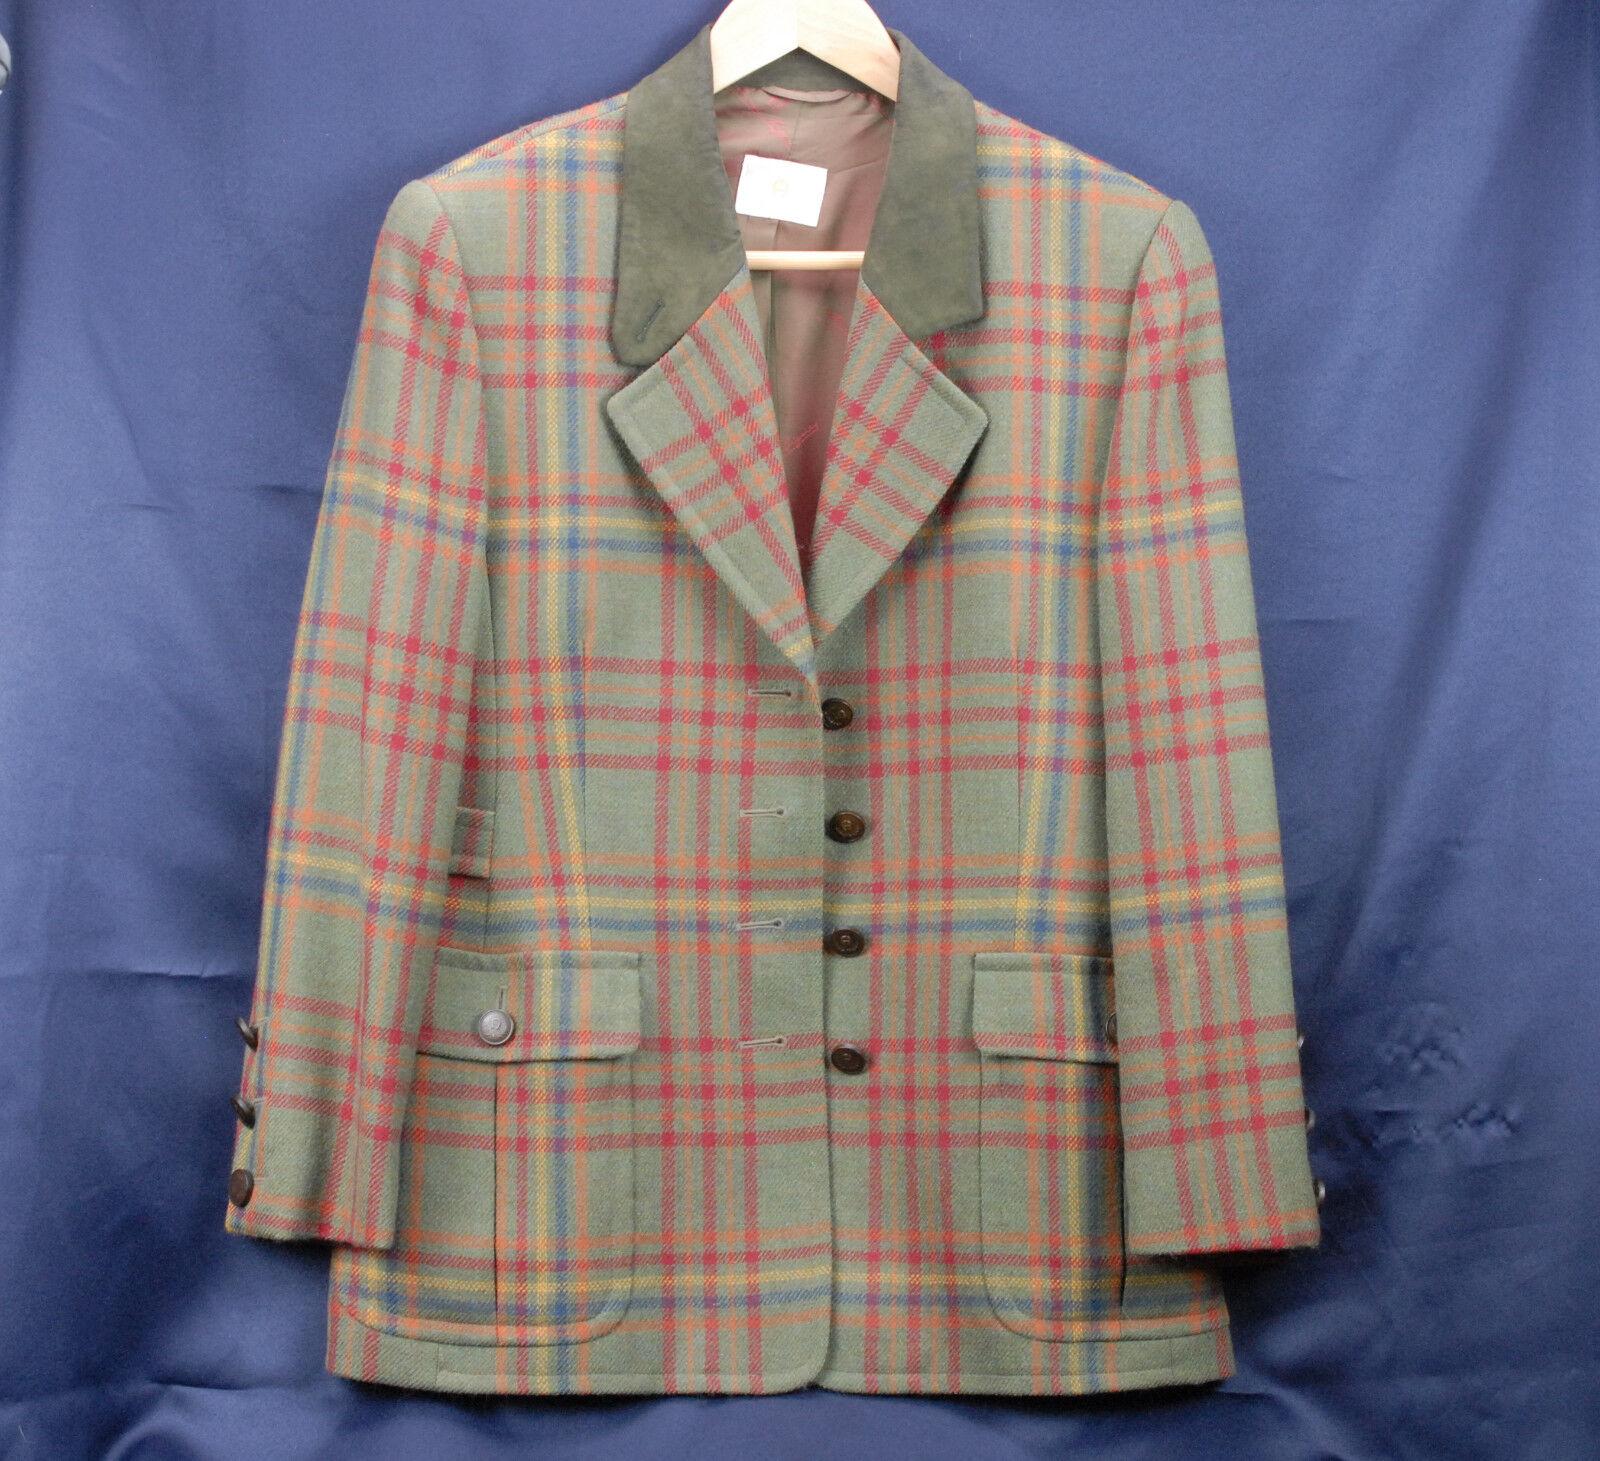 Etienne Aigner Ladies 100% Lambswool Ridding Blazer Green Plaid 4 Button Size 38